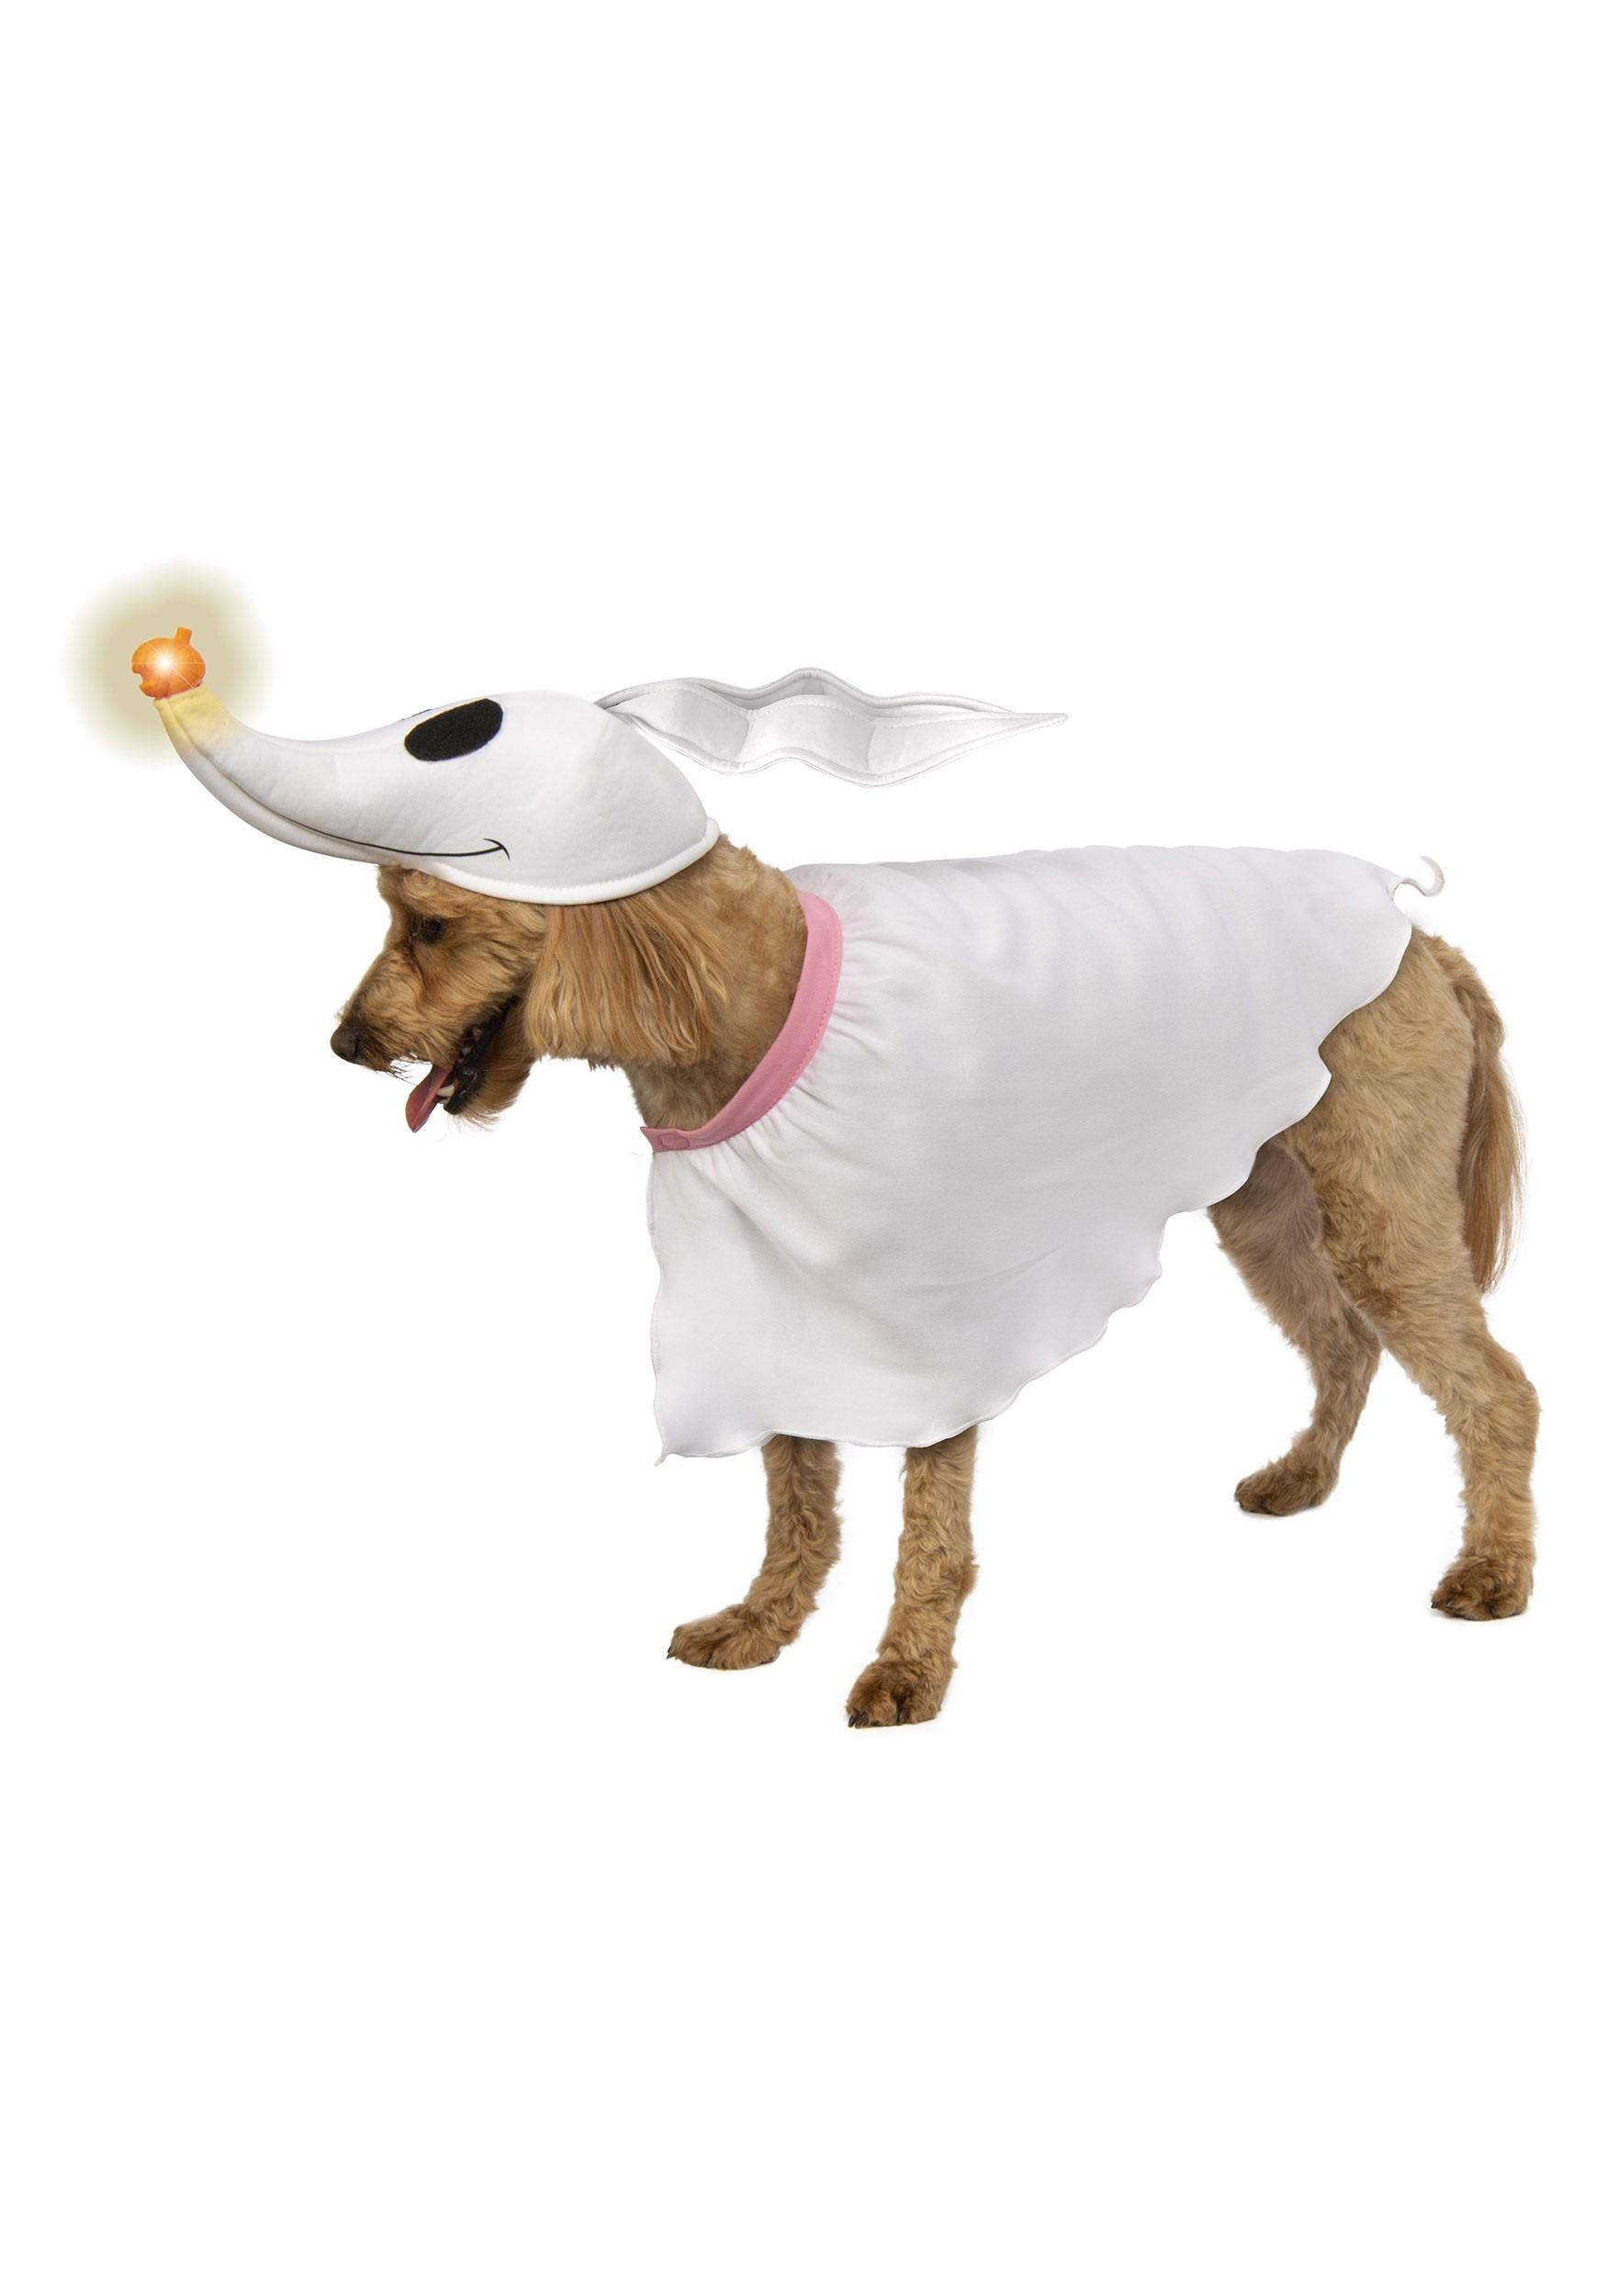 The Nightmare Before Christmas Zero Dog Costume with Light